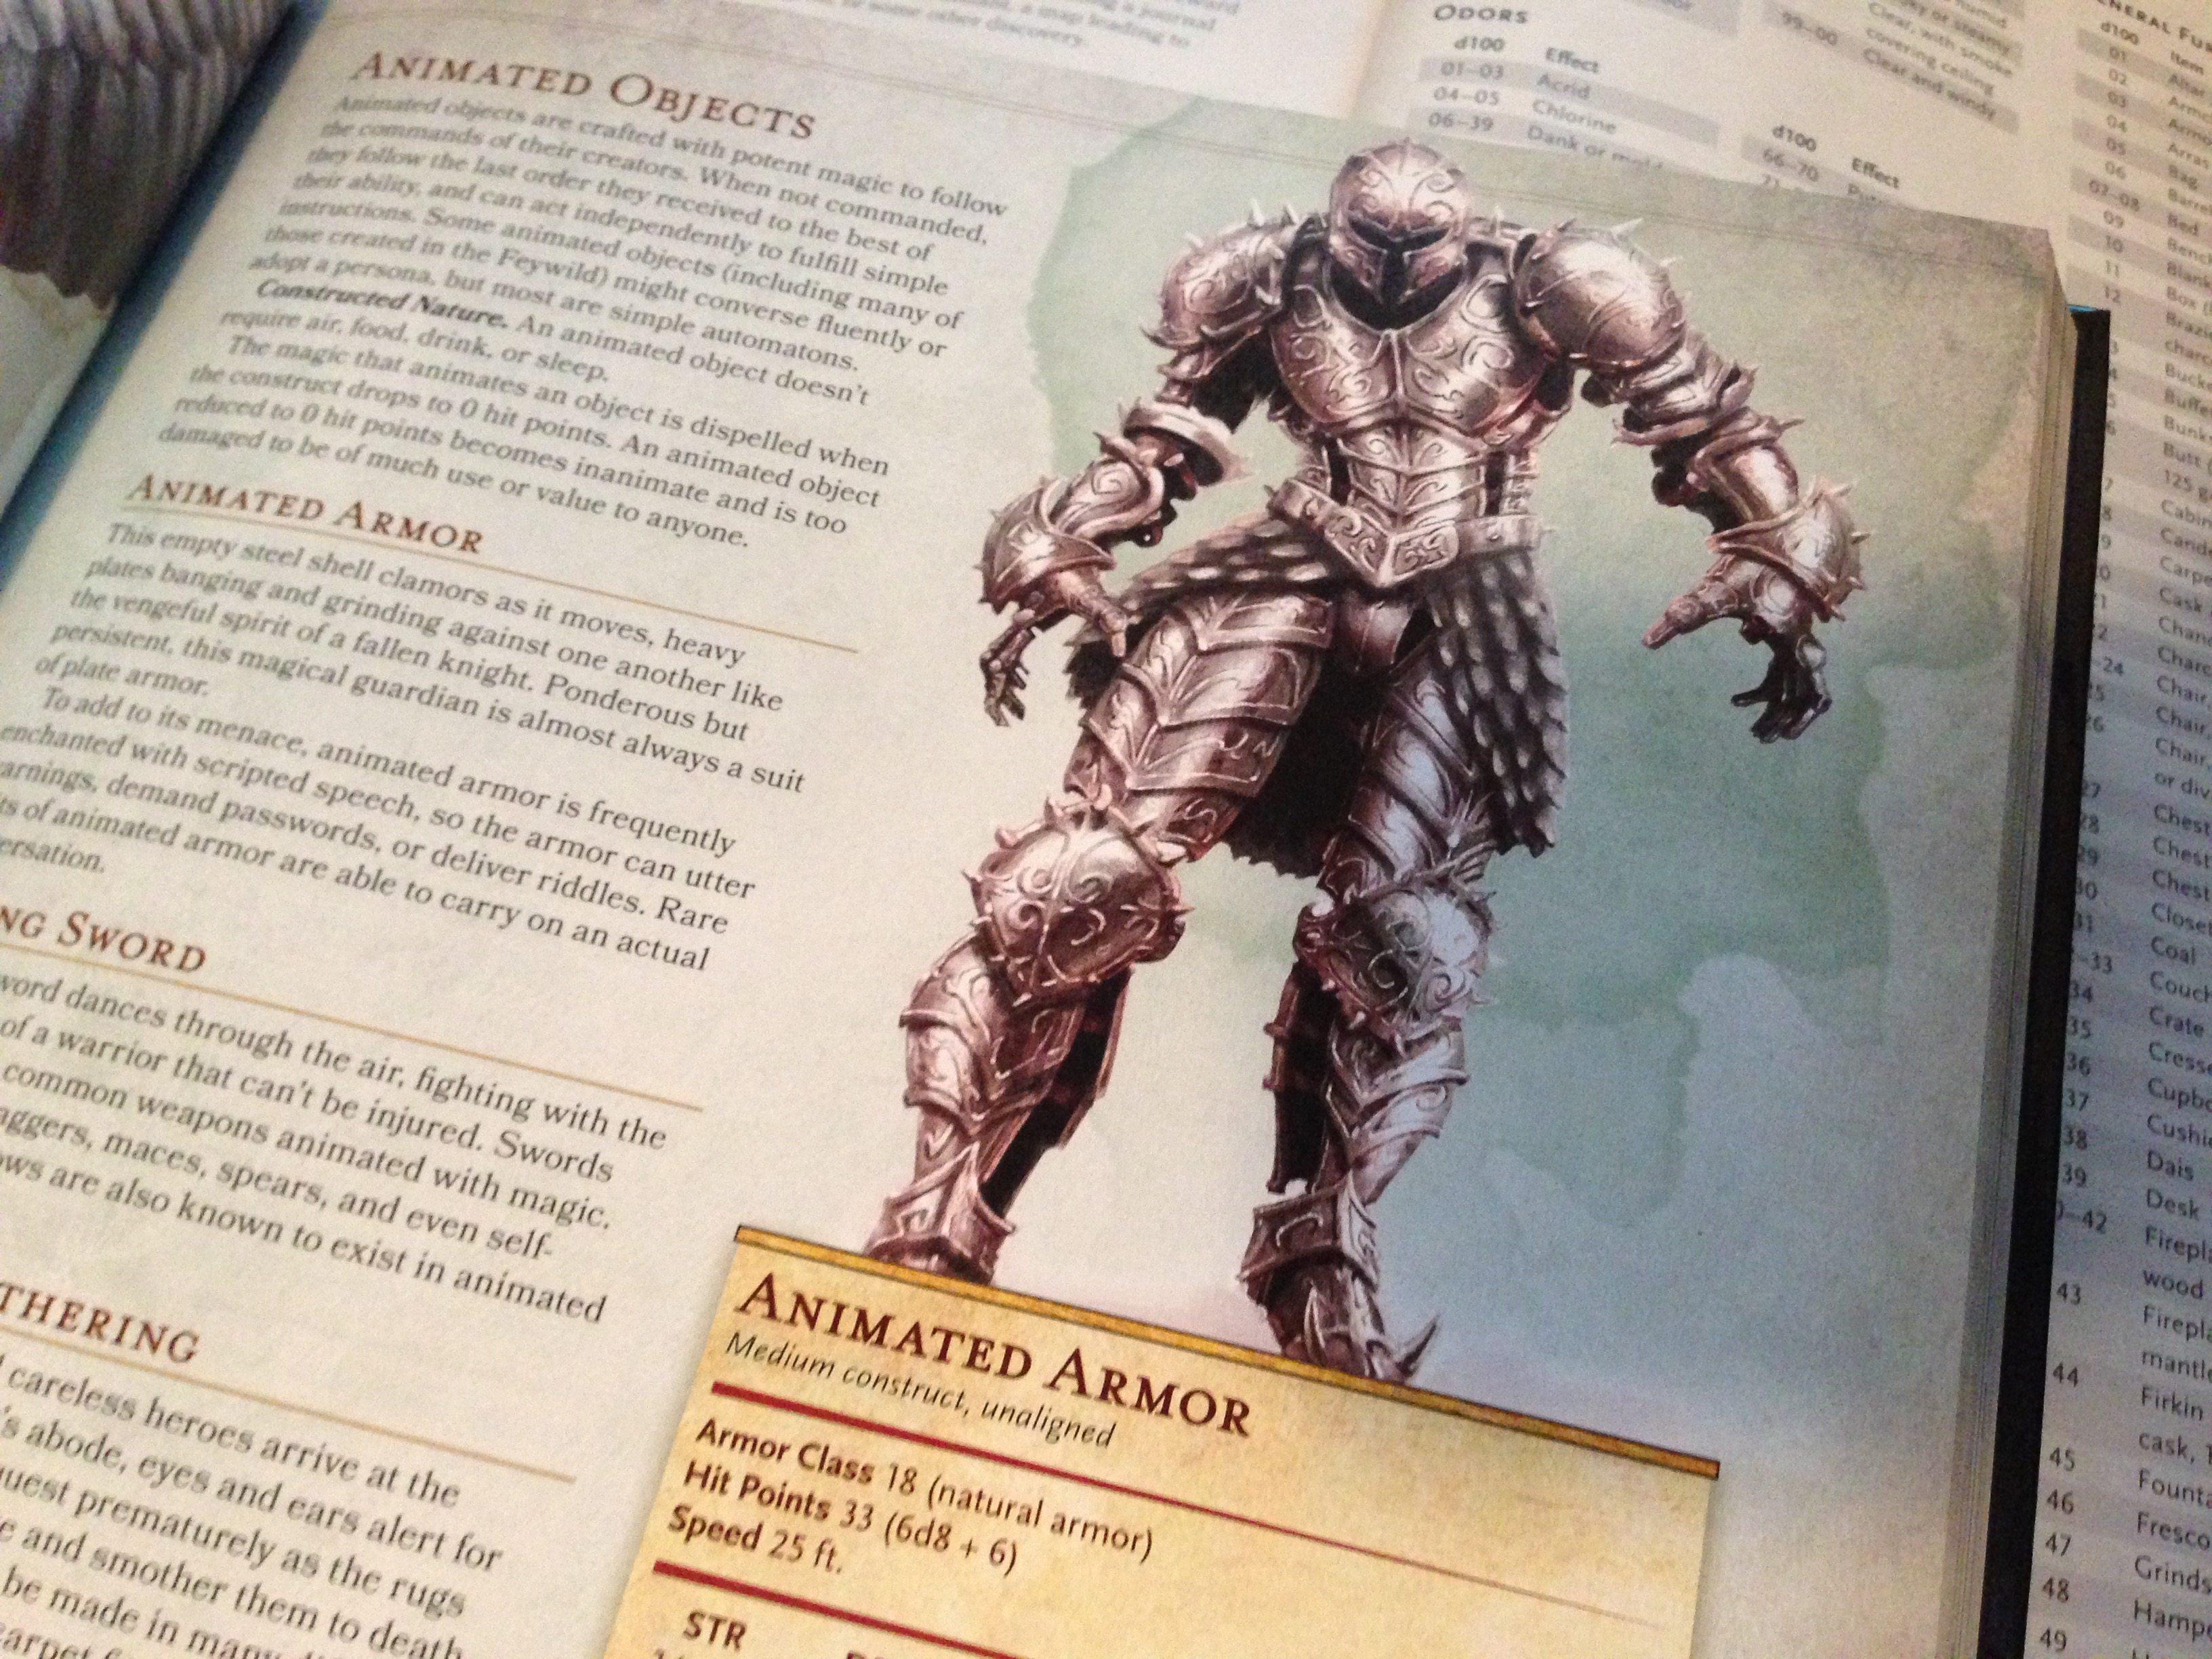 Animated Armor